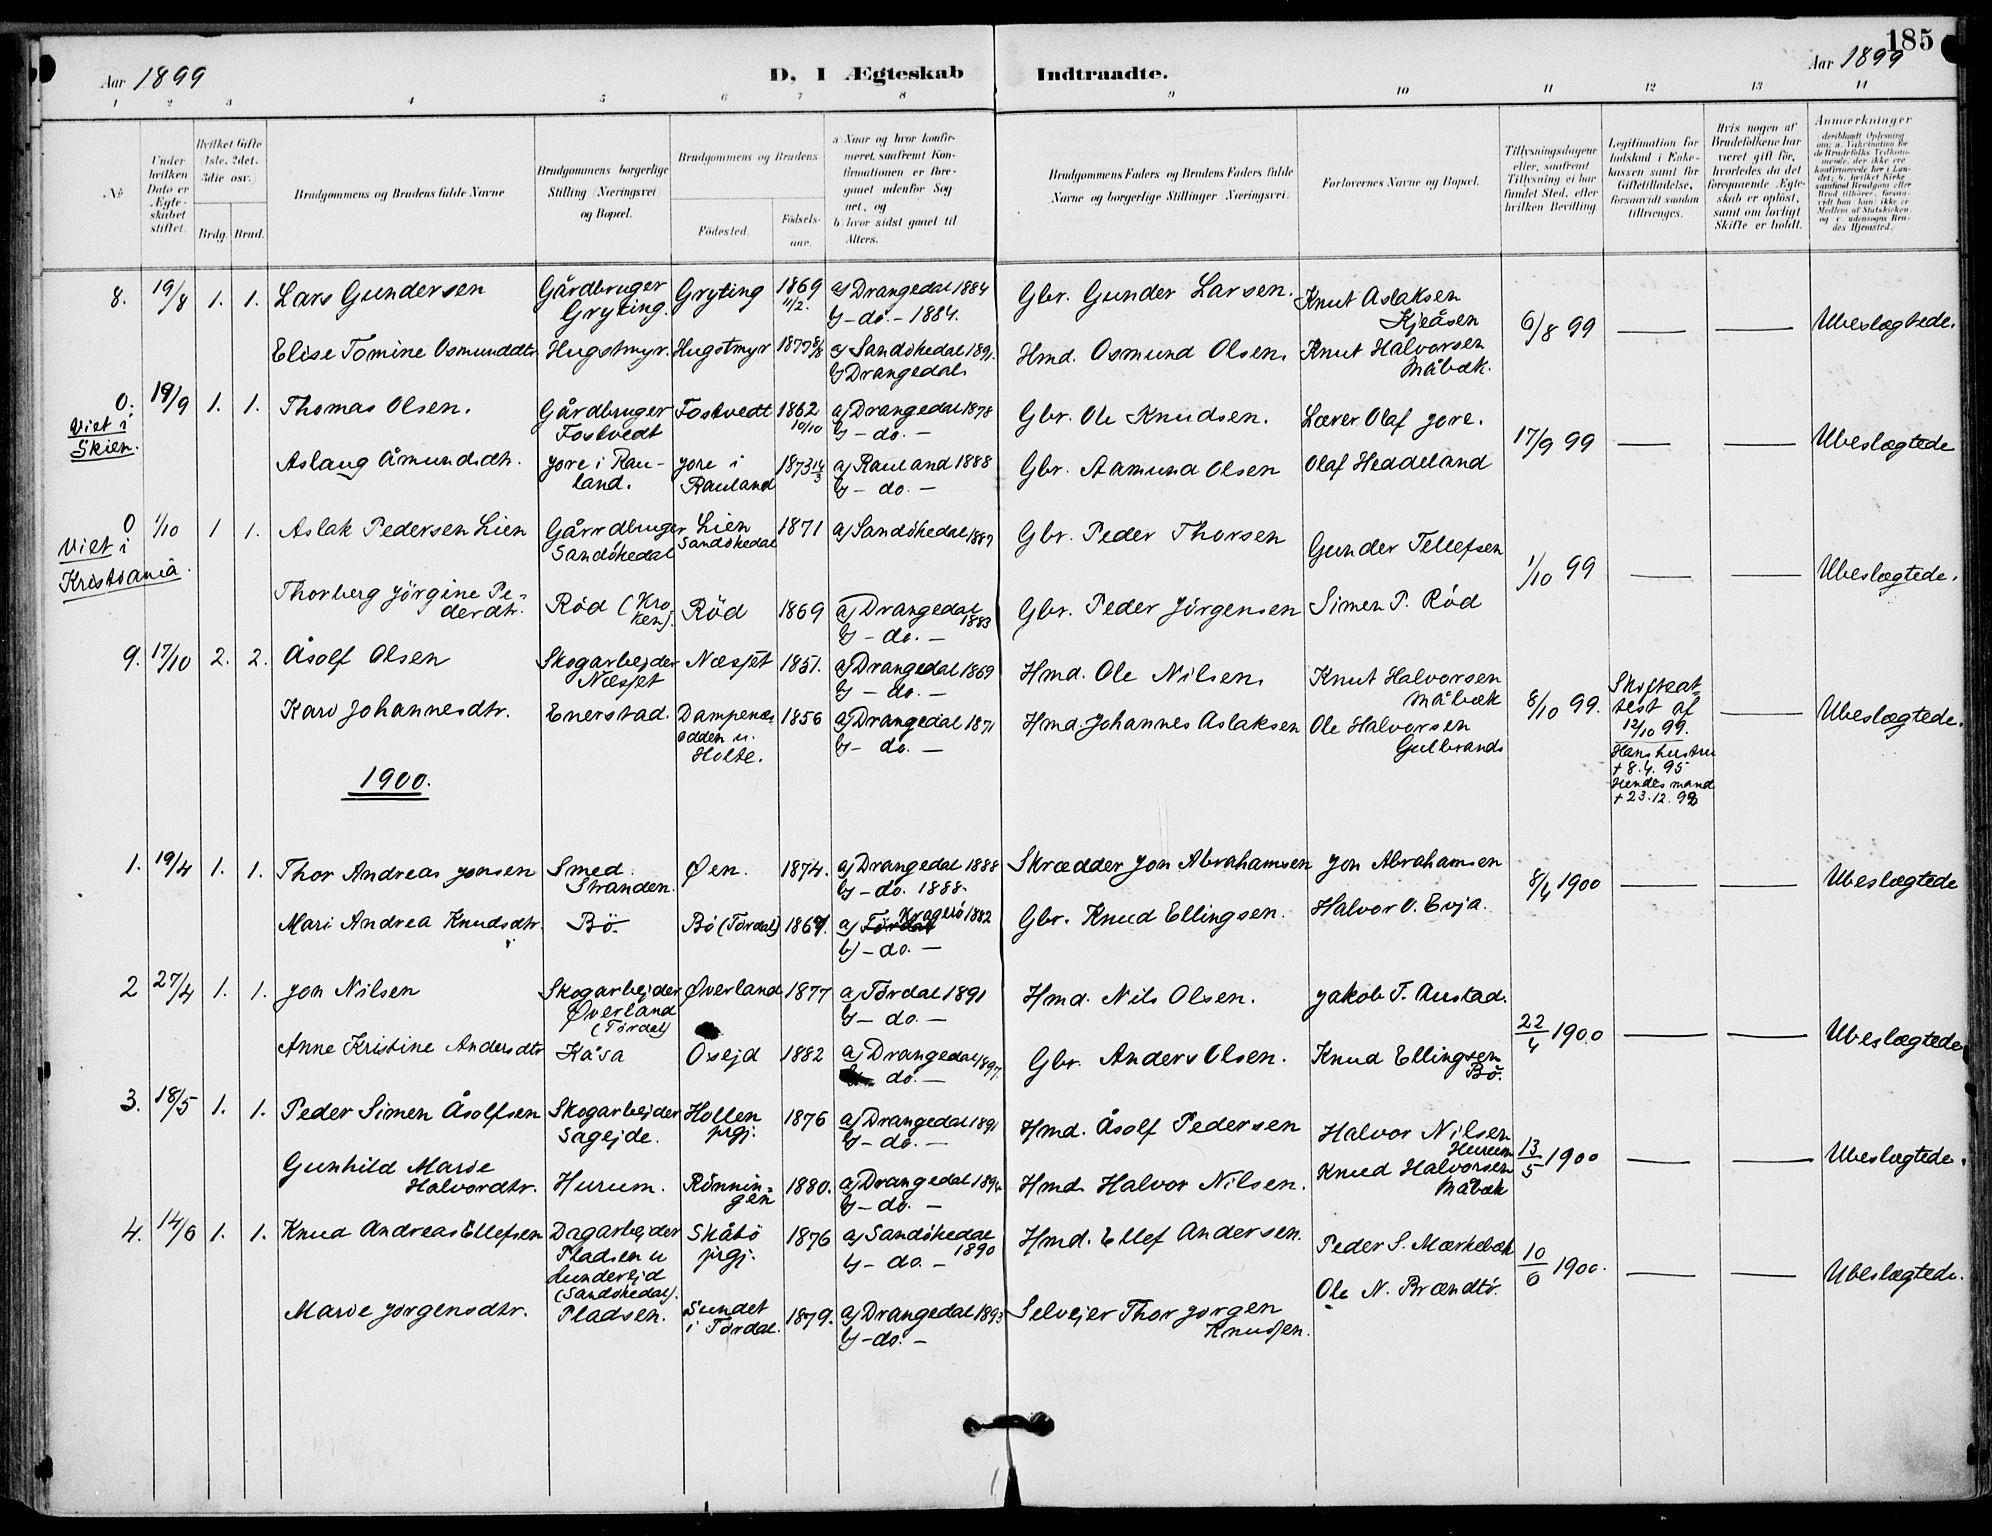 SAKO, Drangedal kirkebøker, F/Fa/L0012: Ministerialbok nr. 12, 1895-1905, s. 185